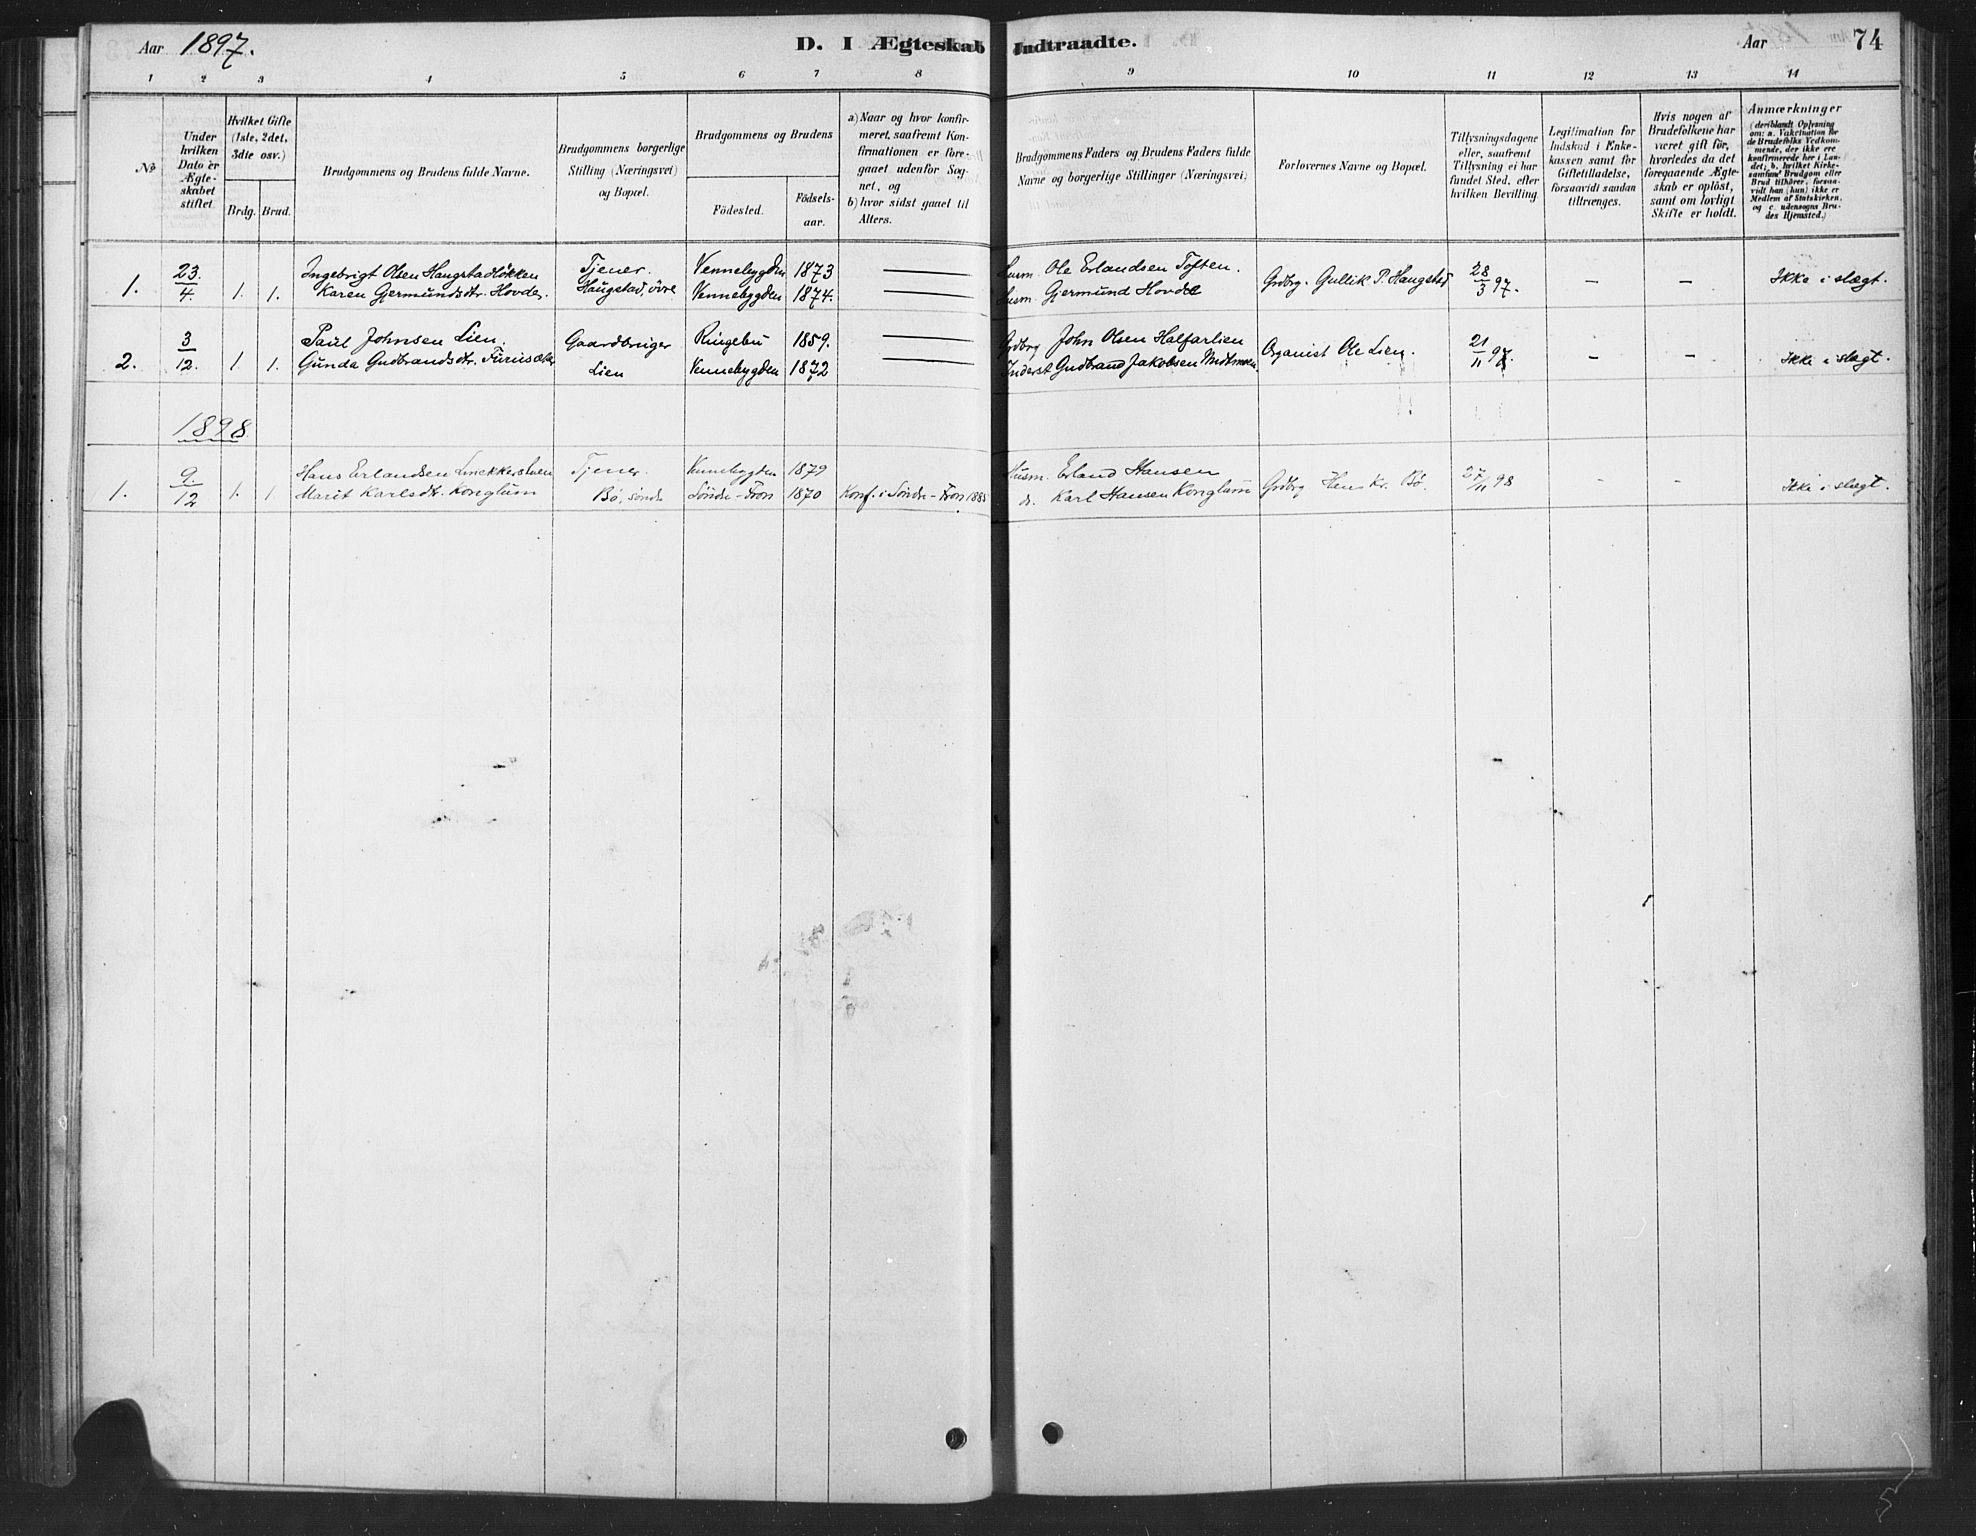 SAH, Ringebu prestekontor, Ministerialbok nr. 10, 1878-1898, s. 74